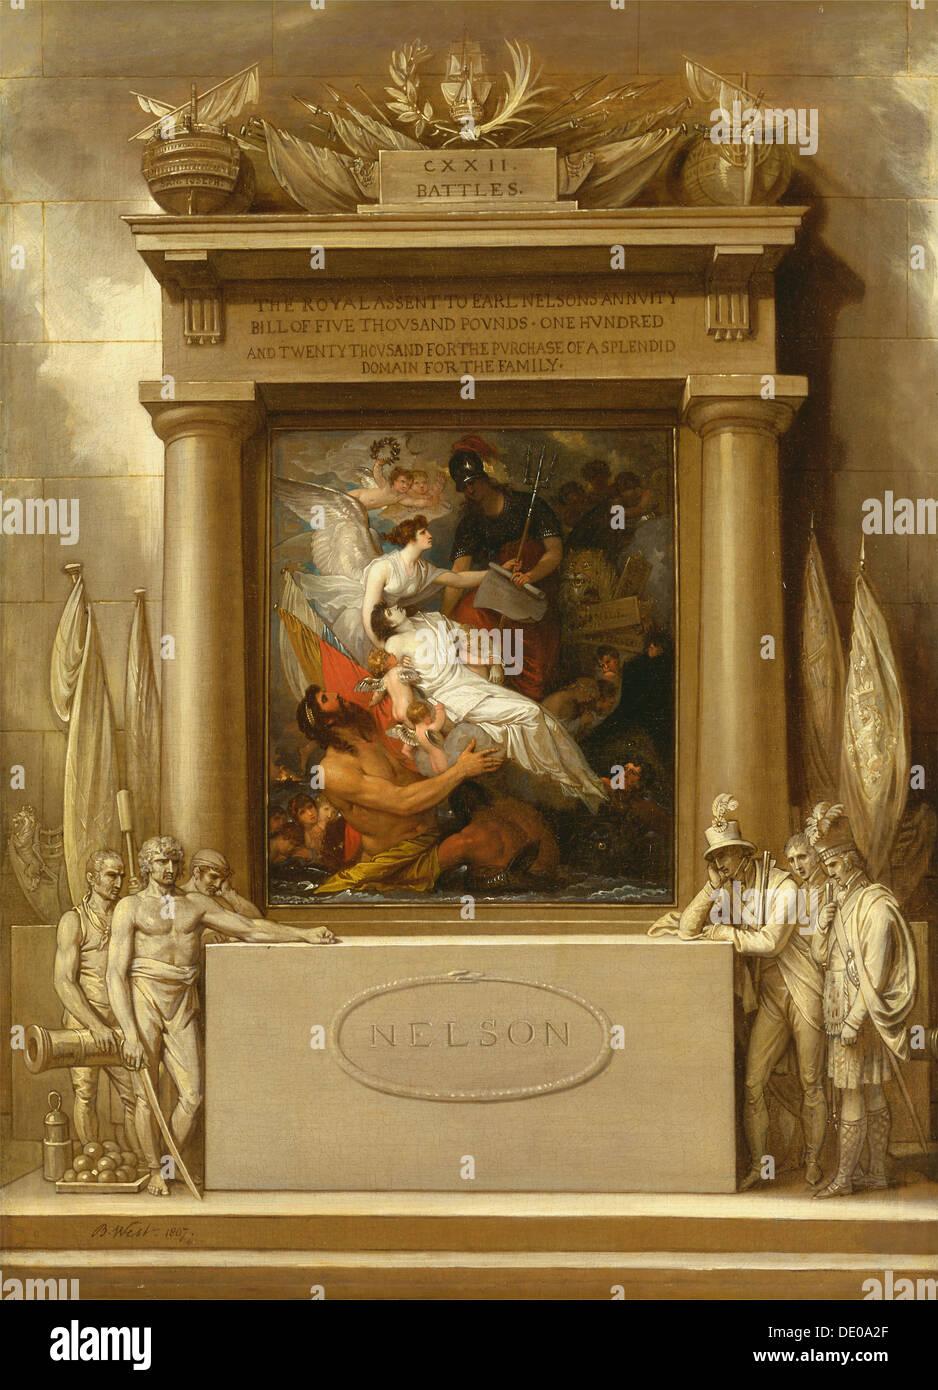 The Apotheosis of Nelson, 1807. Artist: West, Benjamin (1738-1820) - Stock Image